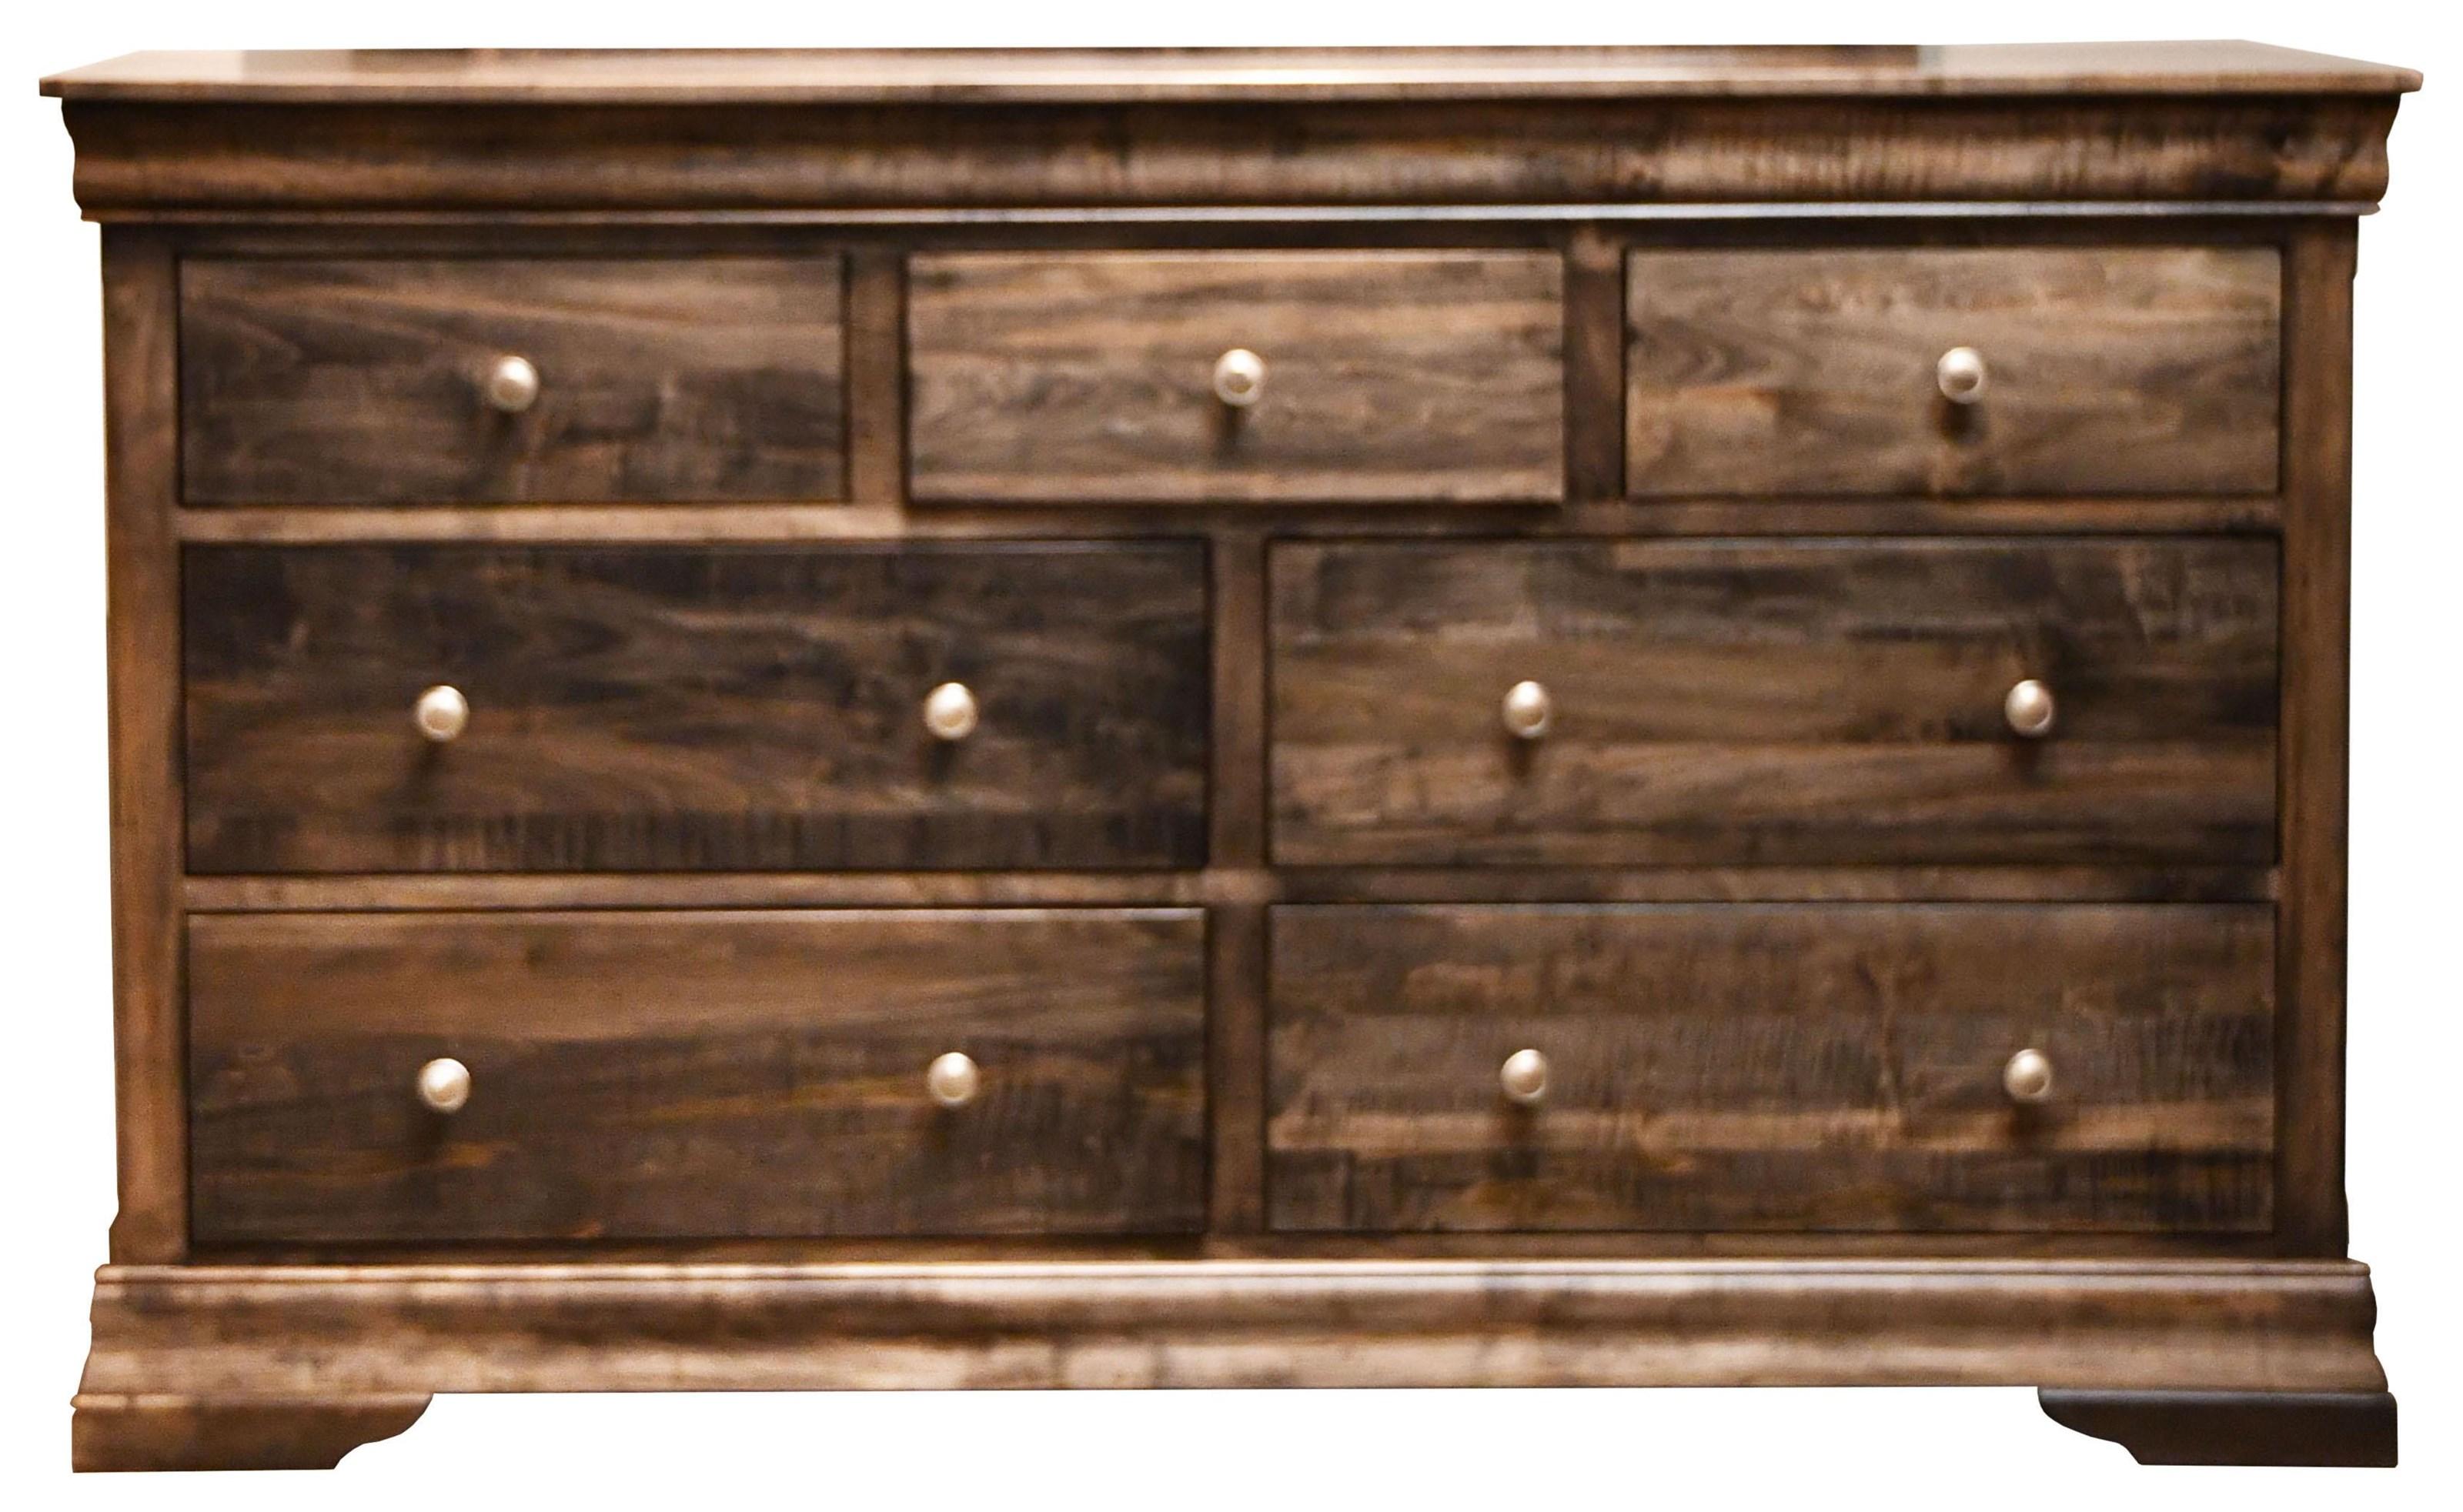 Bayshore 7 Drawer Dresser at Bennett's Furniture and Mattresses